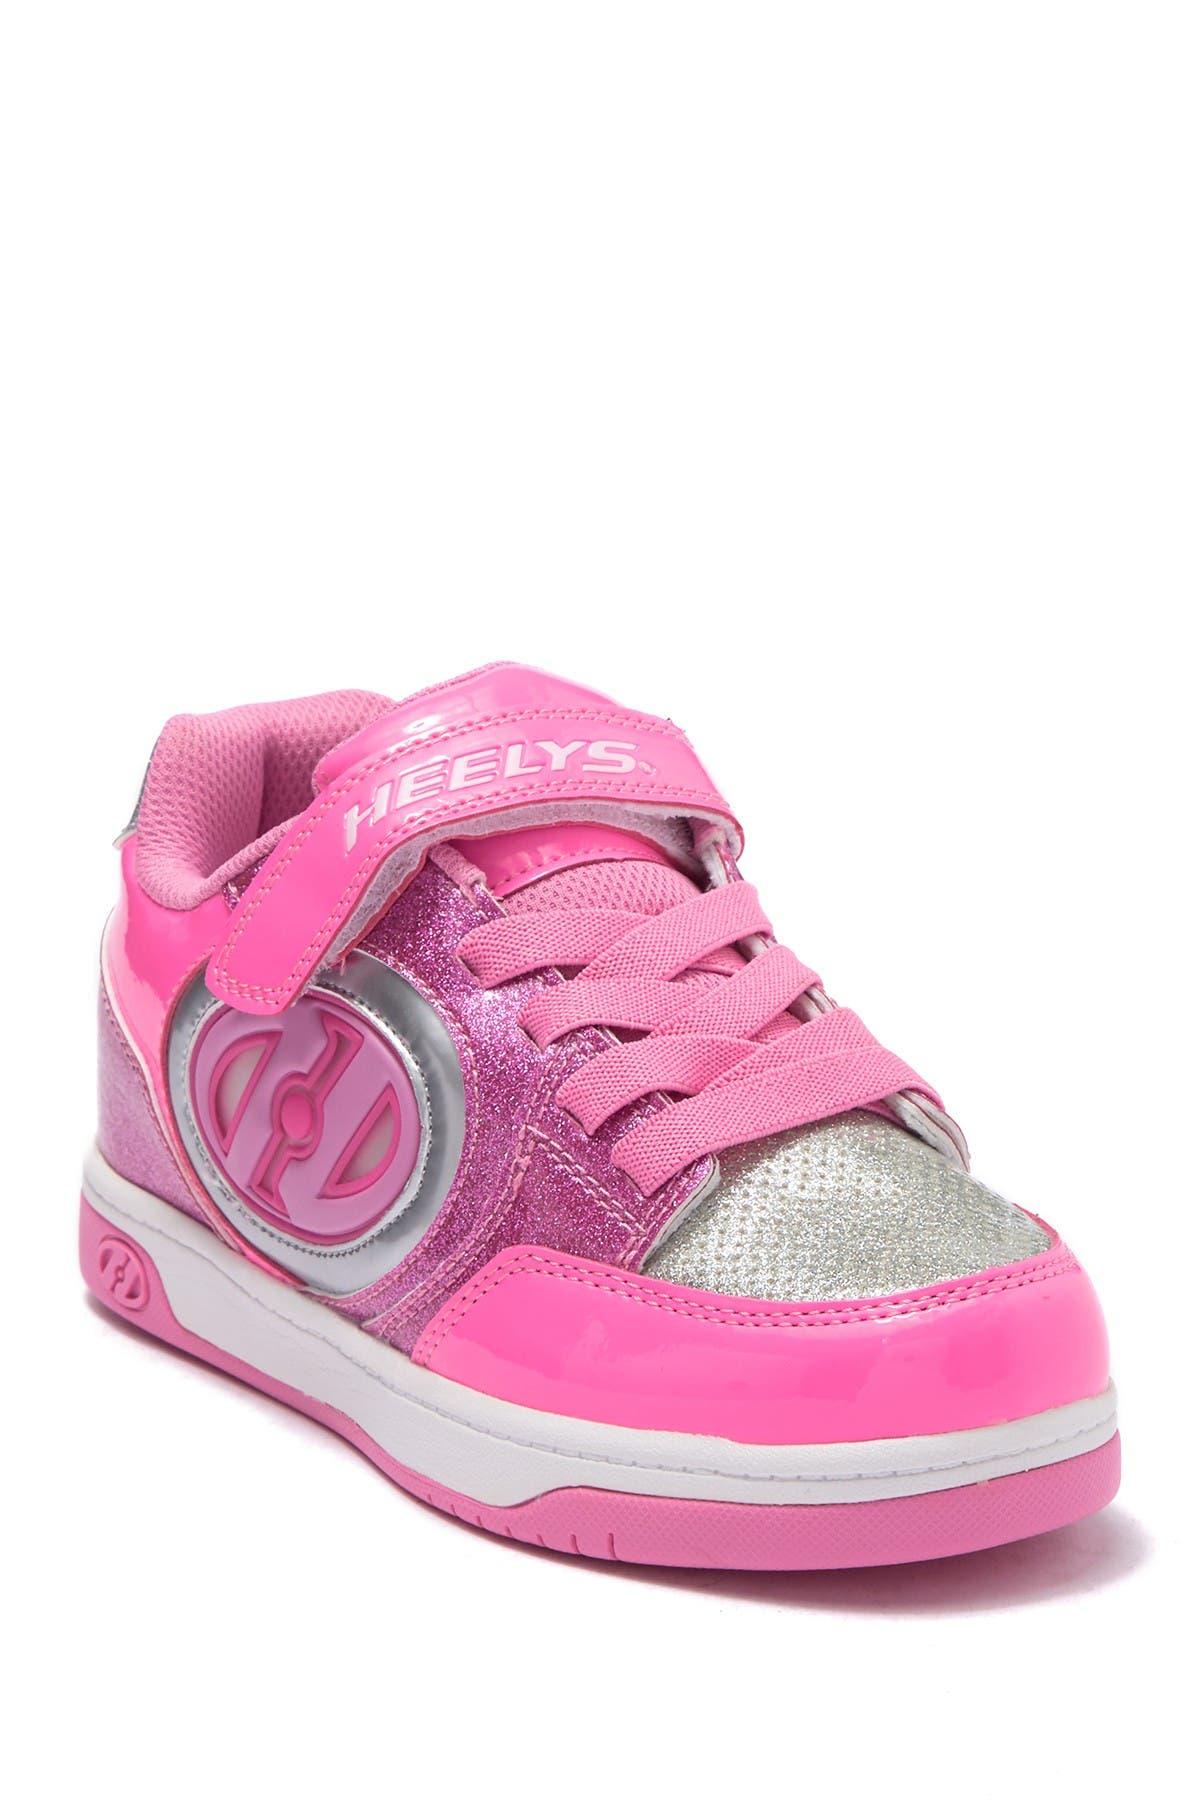 Heelys | Plus X2 Lighted Skate Shoe